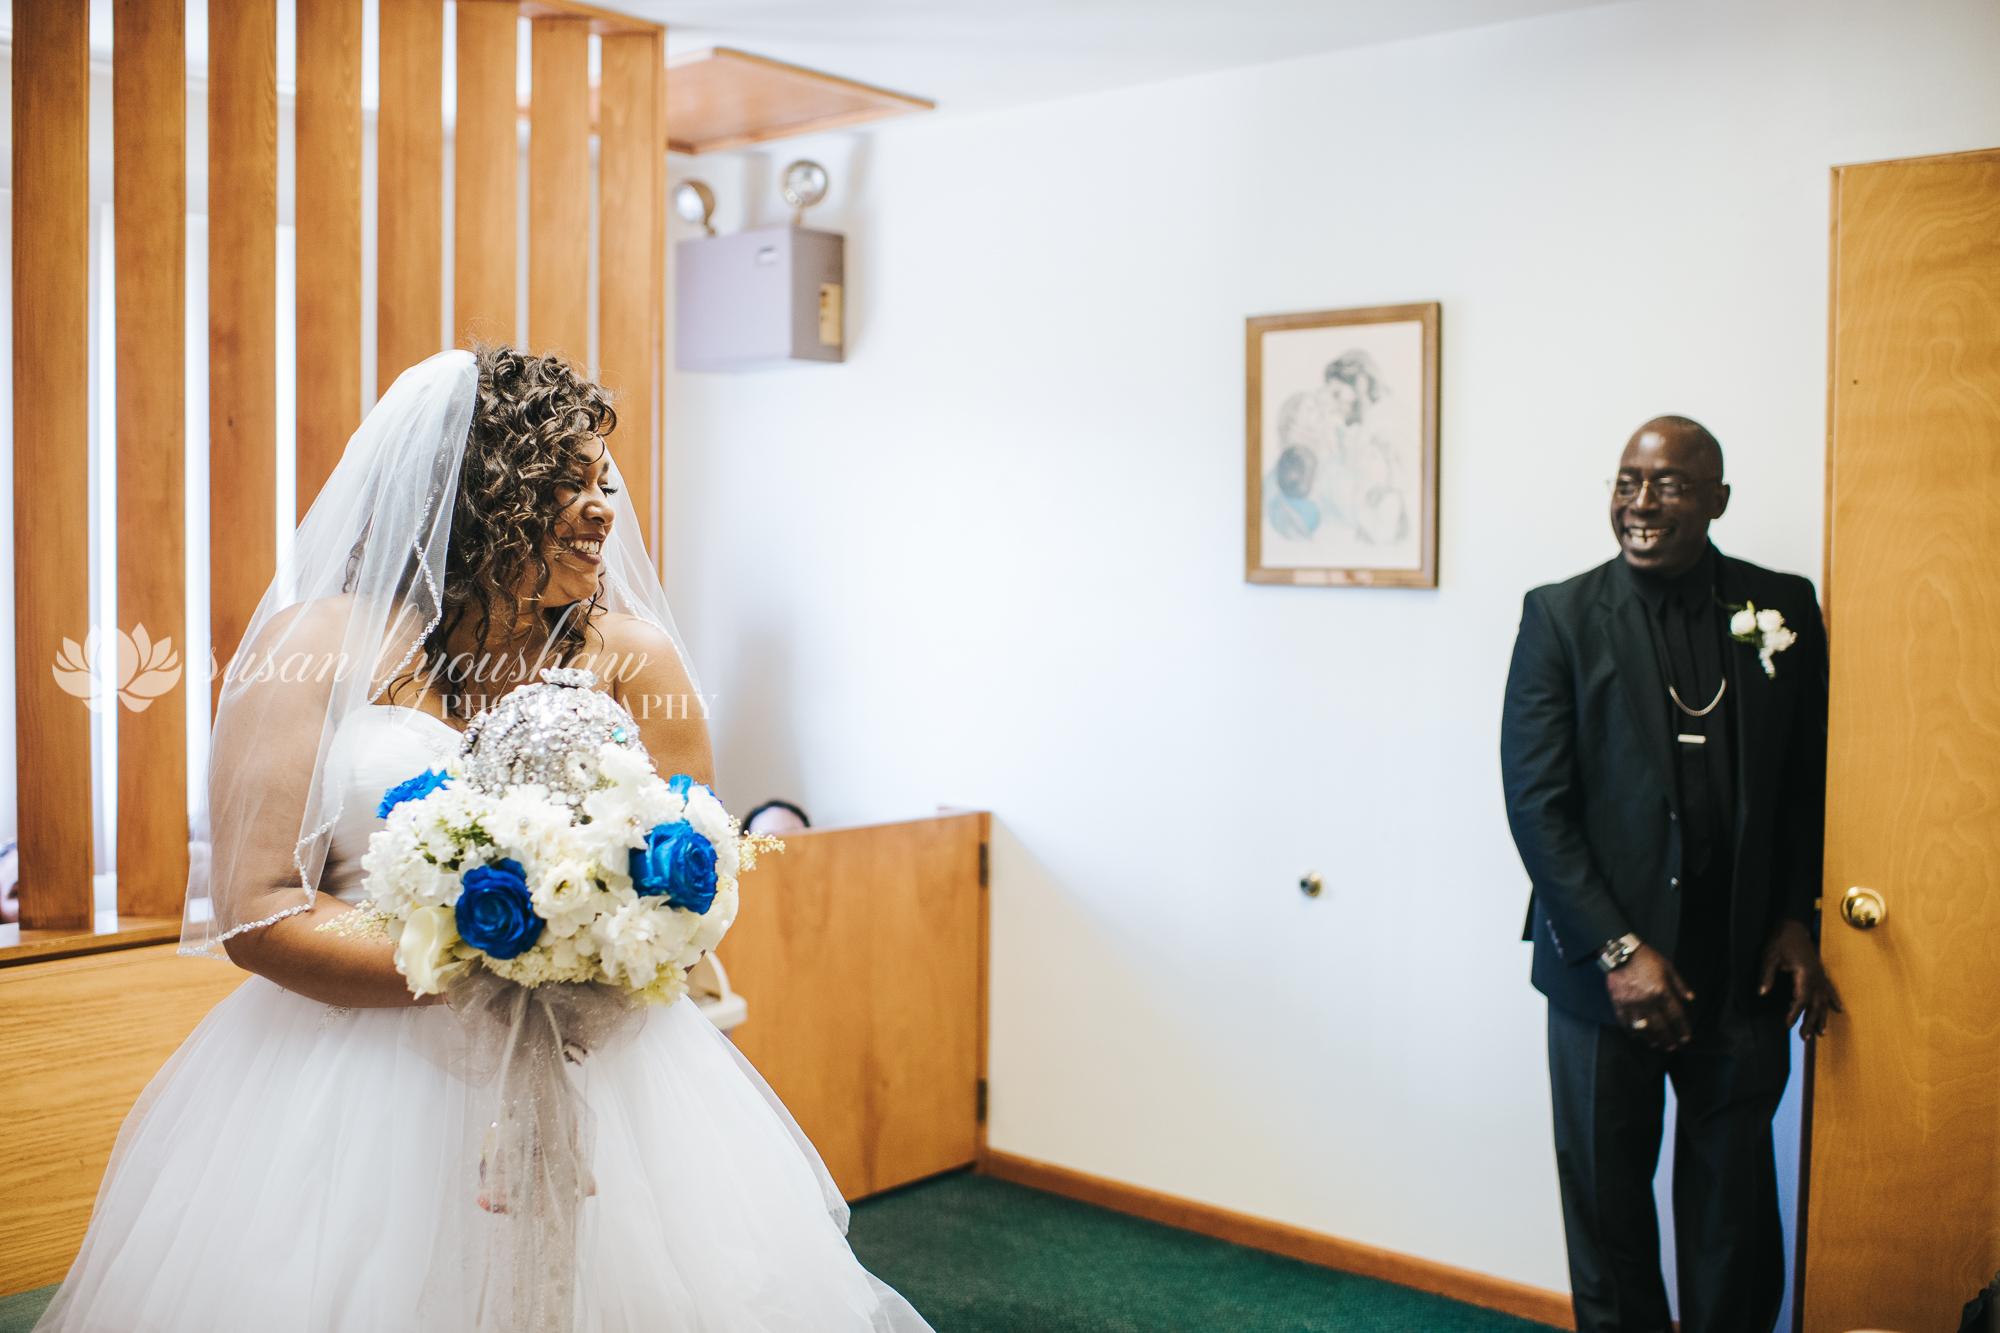 Katelyn and Wes Wedding Photos 07-13-2019 SLY Photography-31.jpg